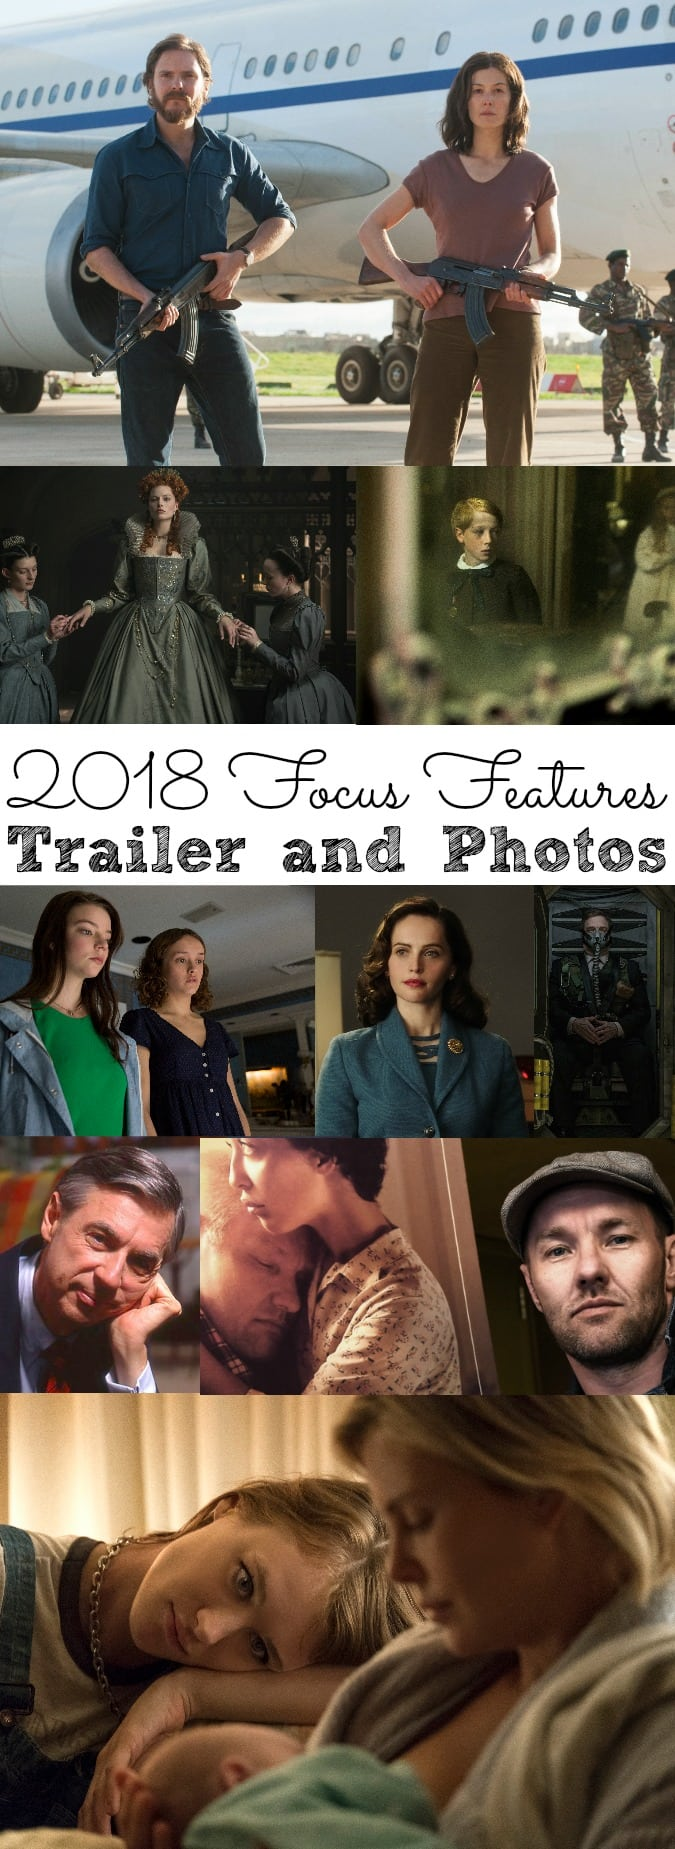 2018 Focus Features Movie Slate Trailer and Photos - simplytodaylife.com